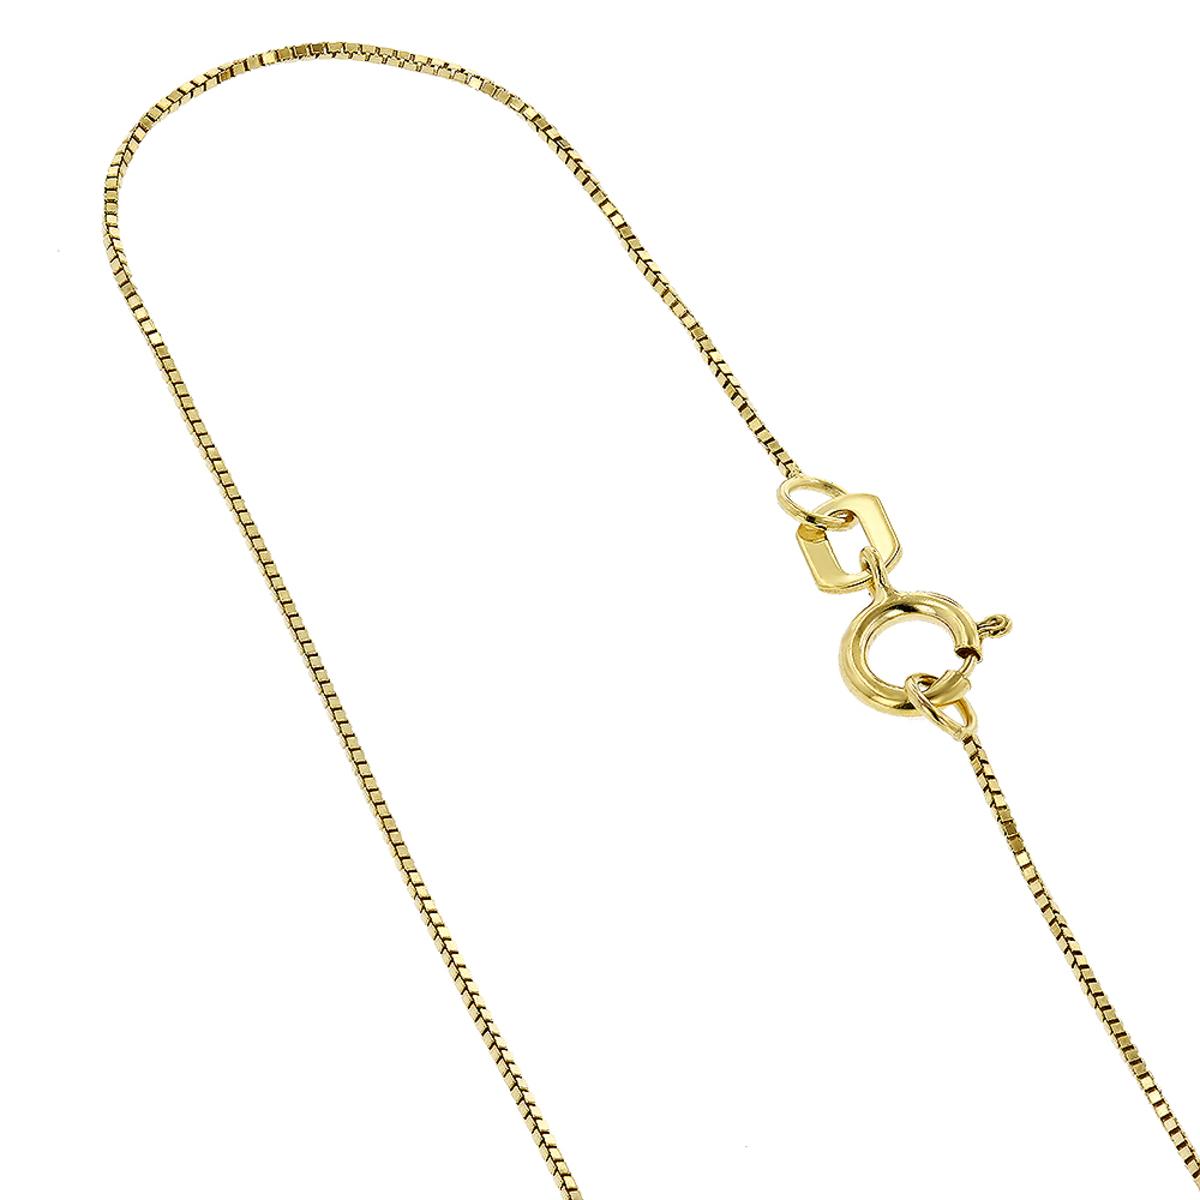 LUXURMAN Solid 10k Gold Box Chain For Women 0.6mm Wide